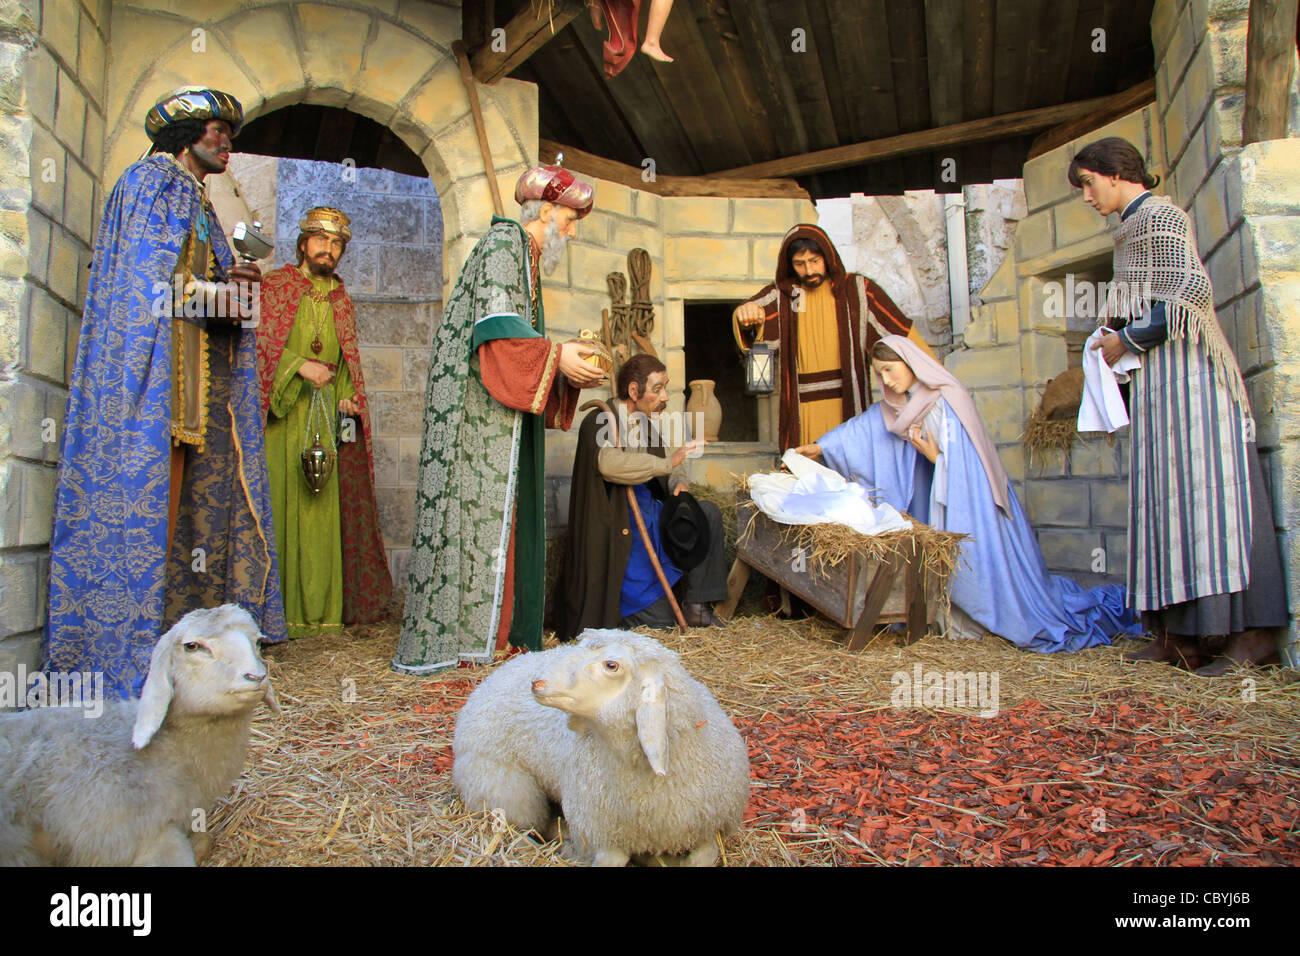 Bethlehem, Nativity Scene at the Church of St. Catherine Stock Photo